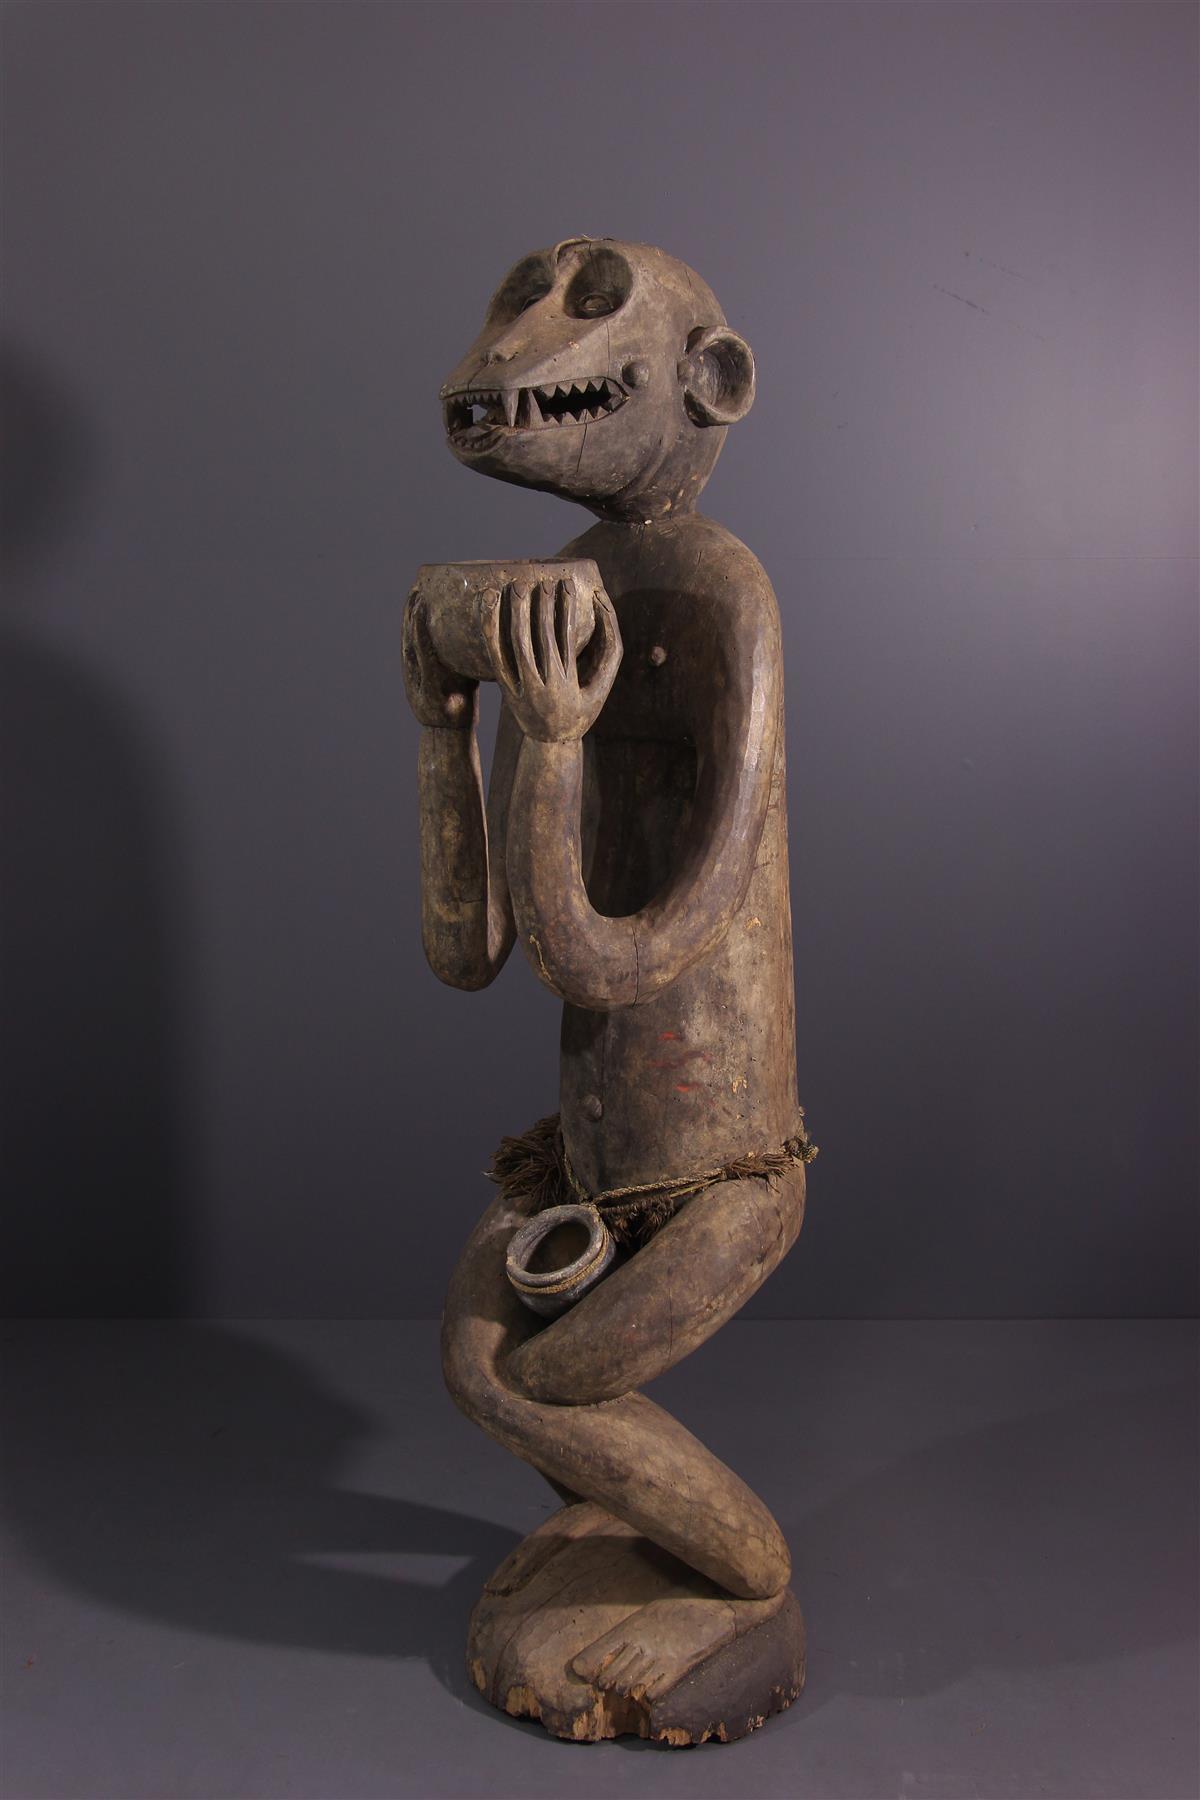 Baoule figure - African art